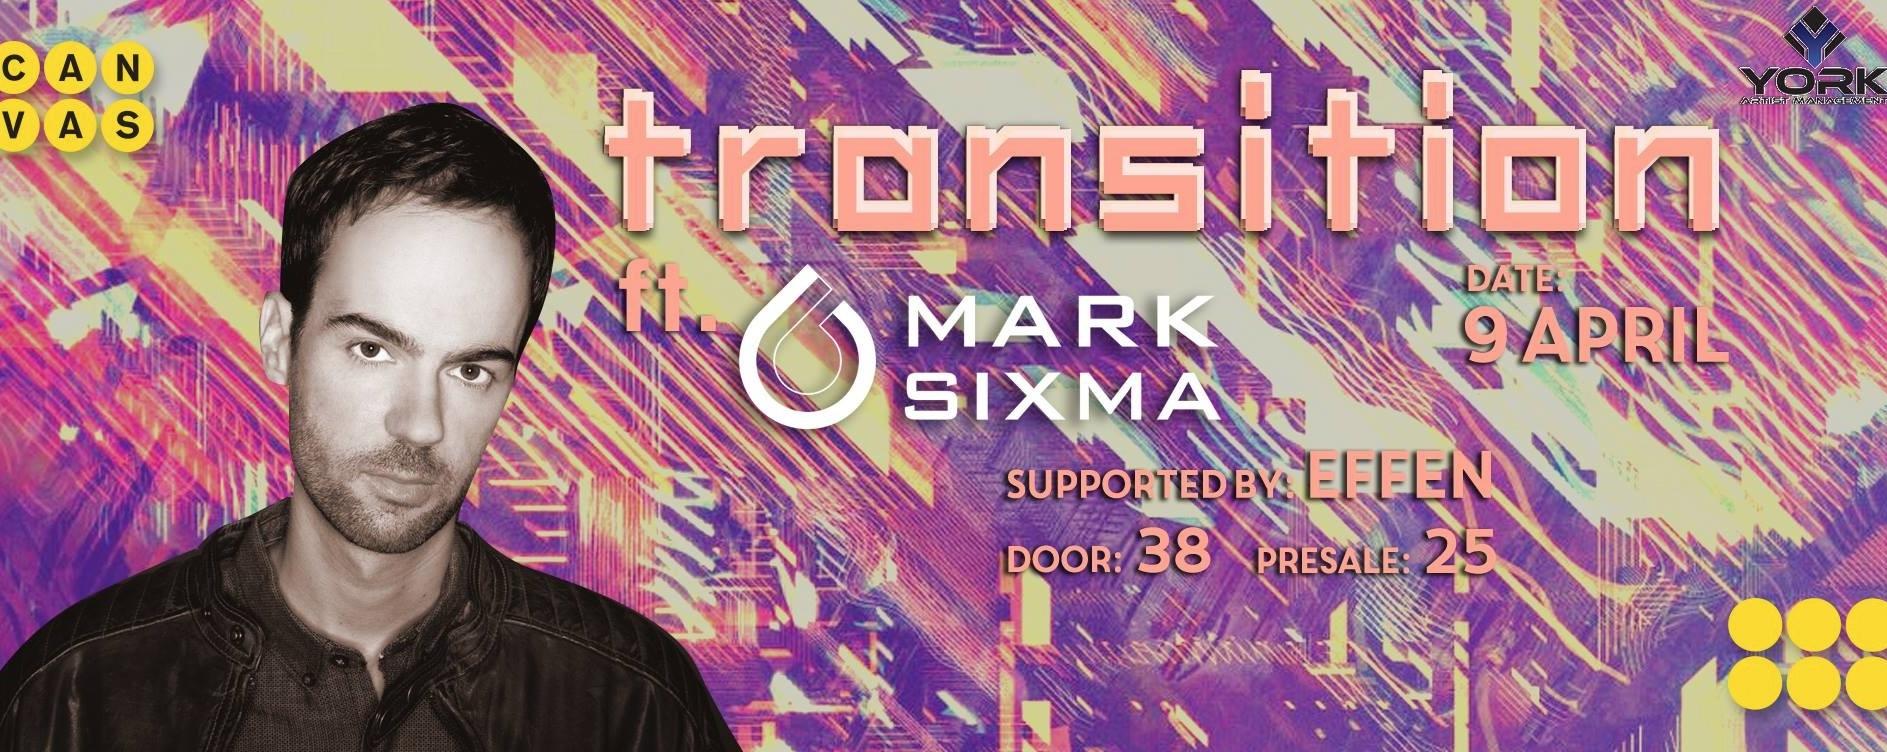 Transition ft. Mark Sixma